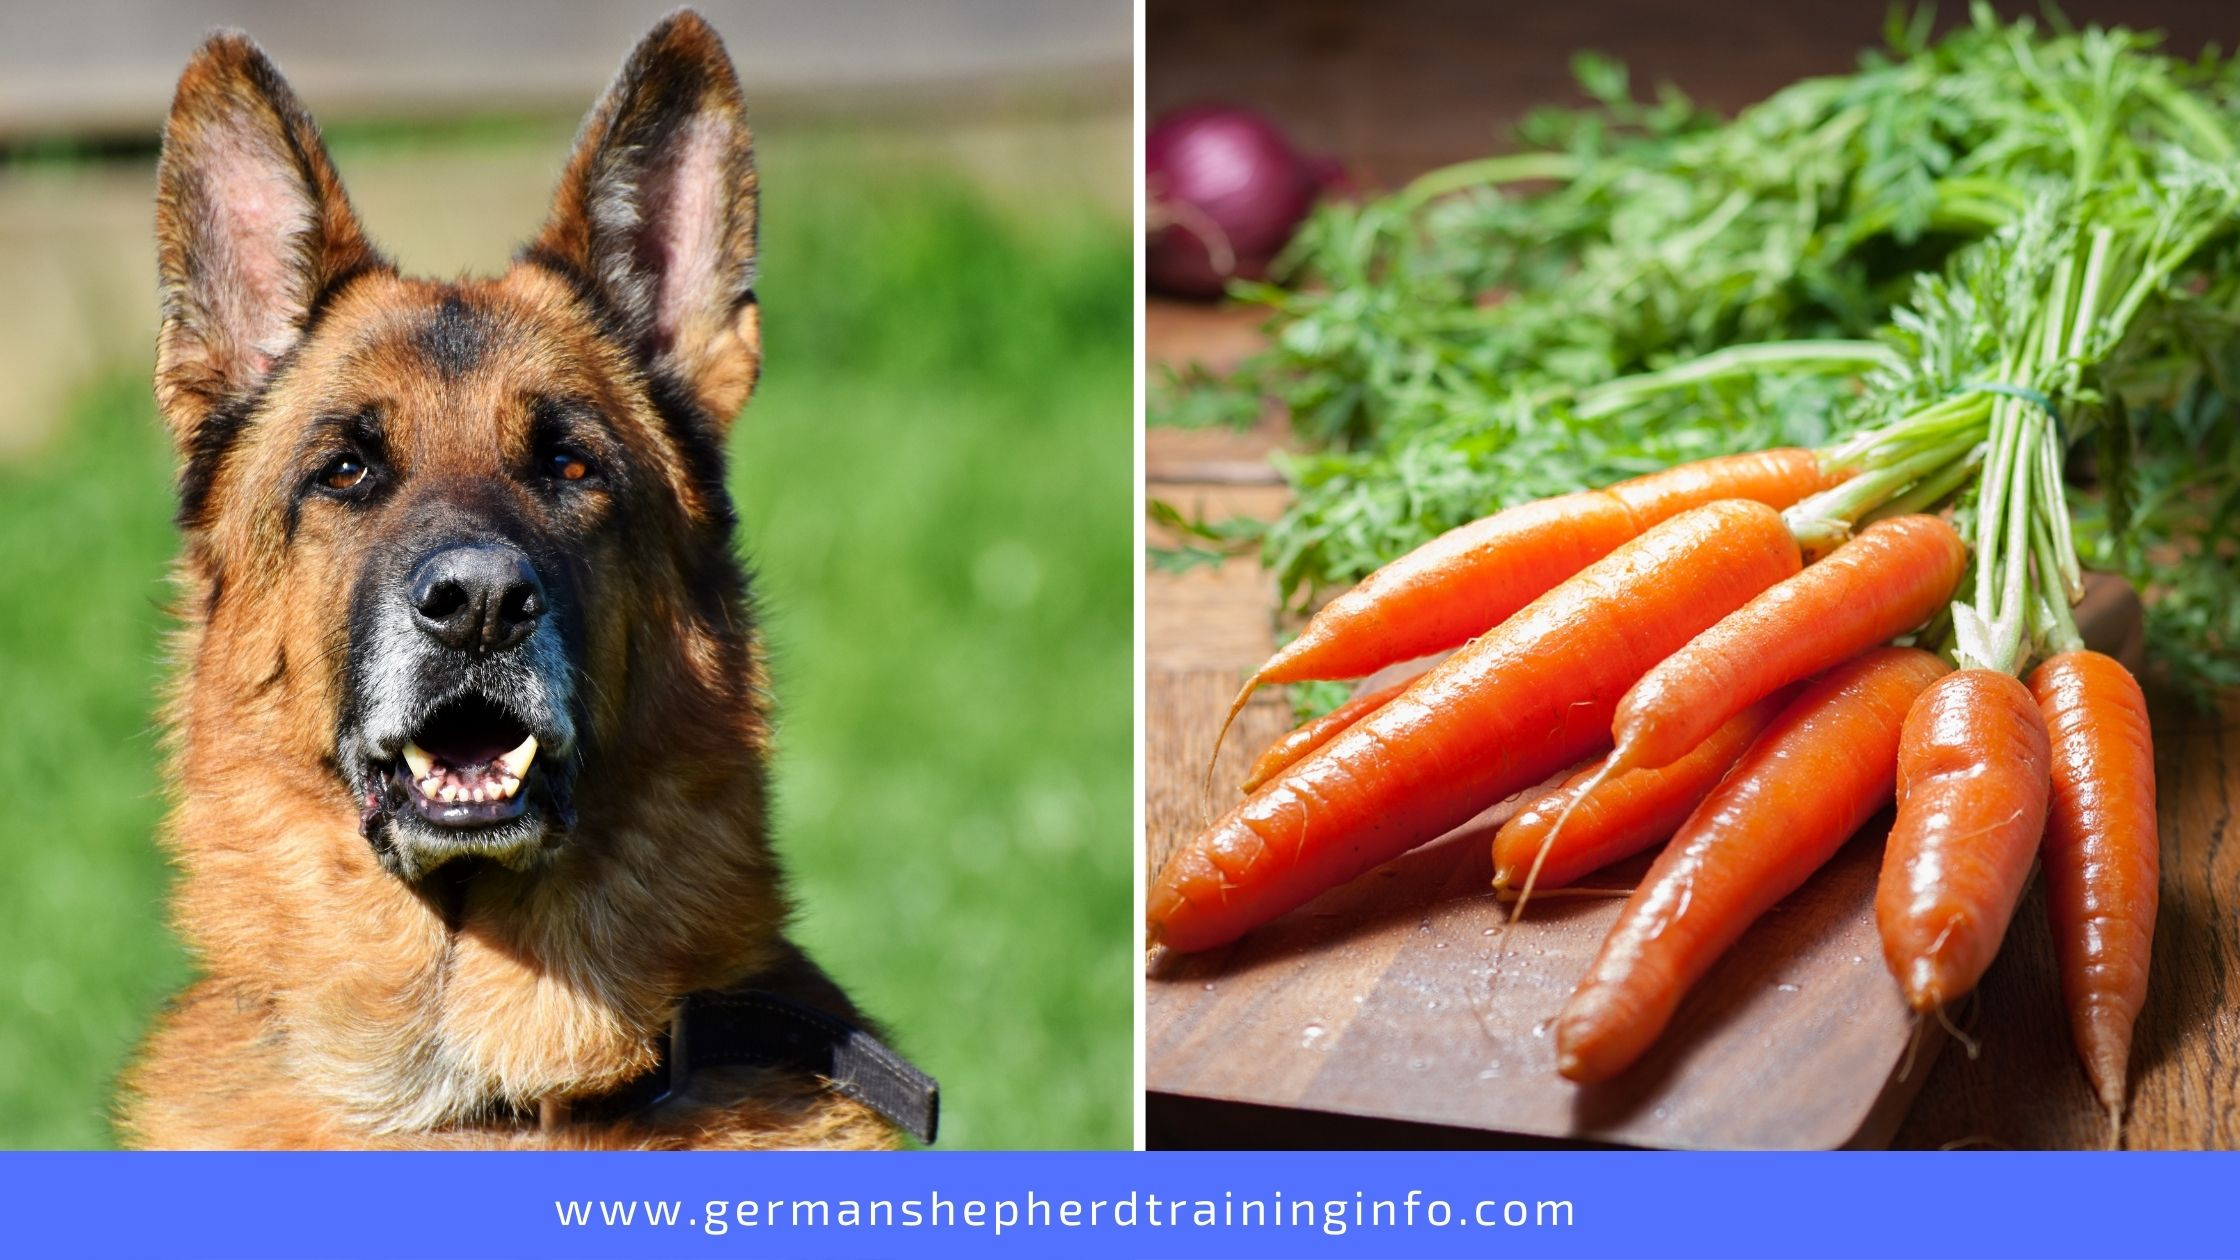 Can German Shepherds eat carrots?